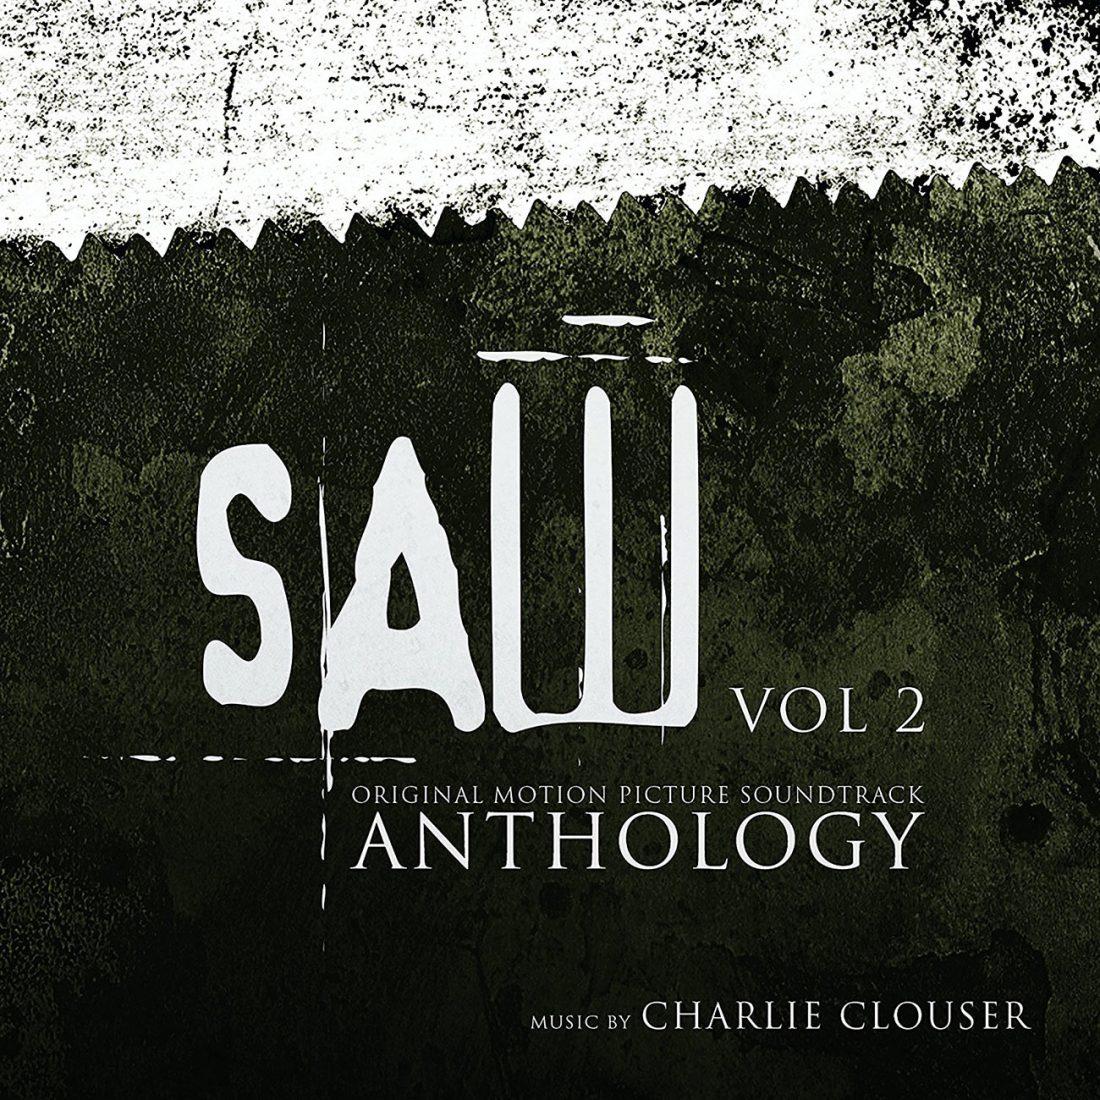 Saw Anthology Volume 2: Original Motion Picture Music Soundtrack